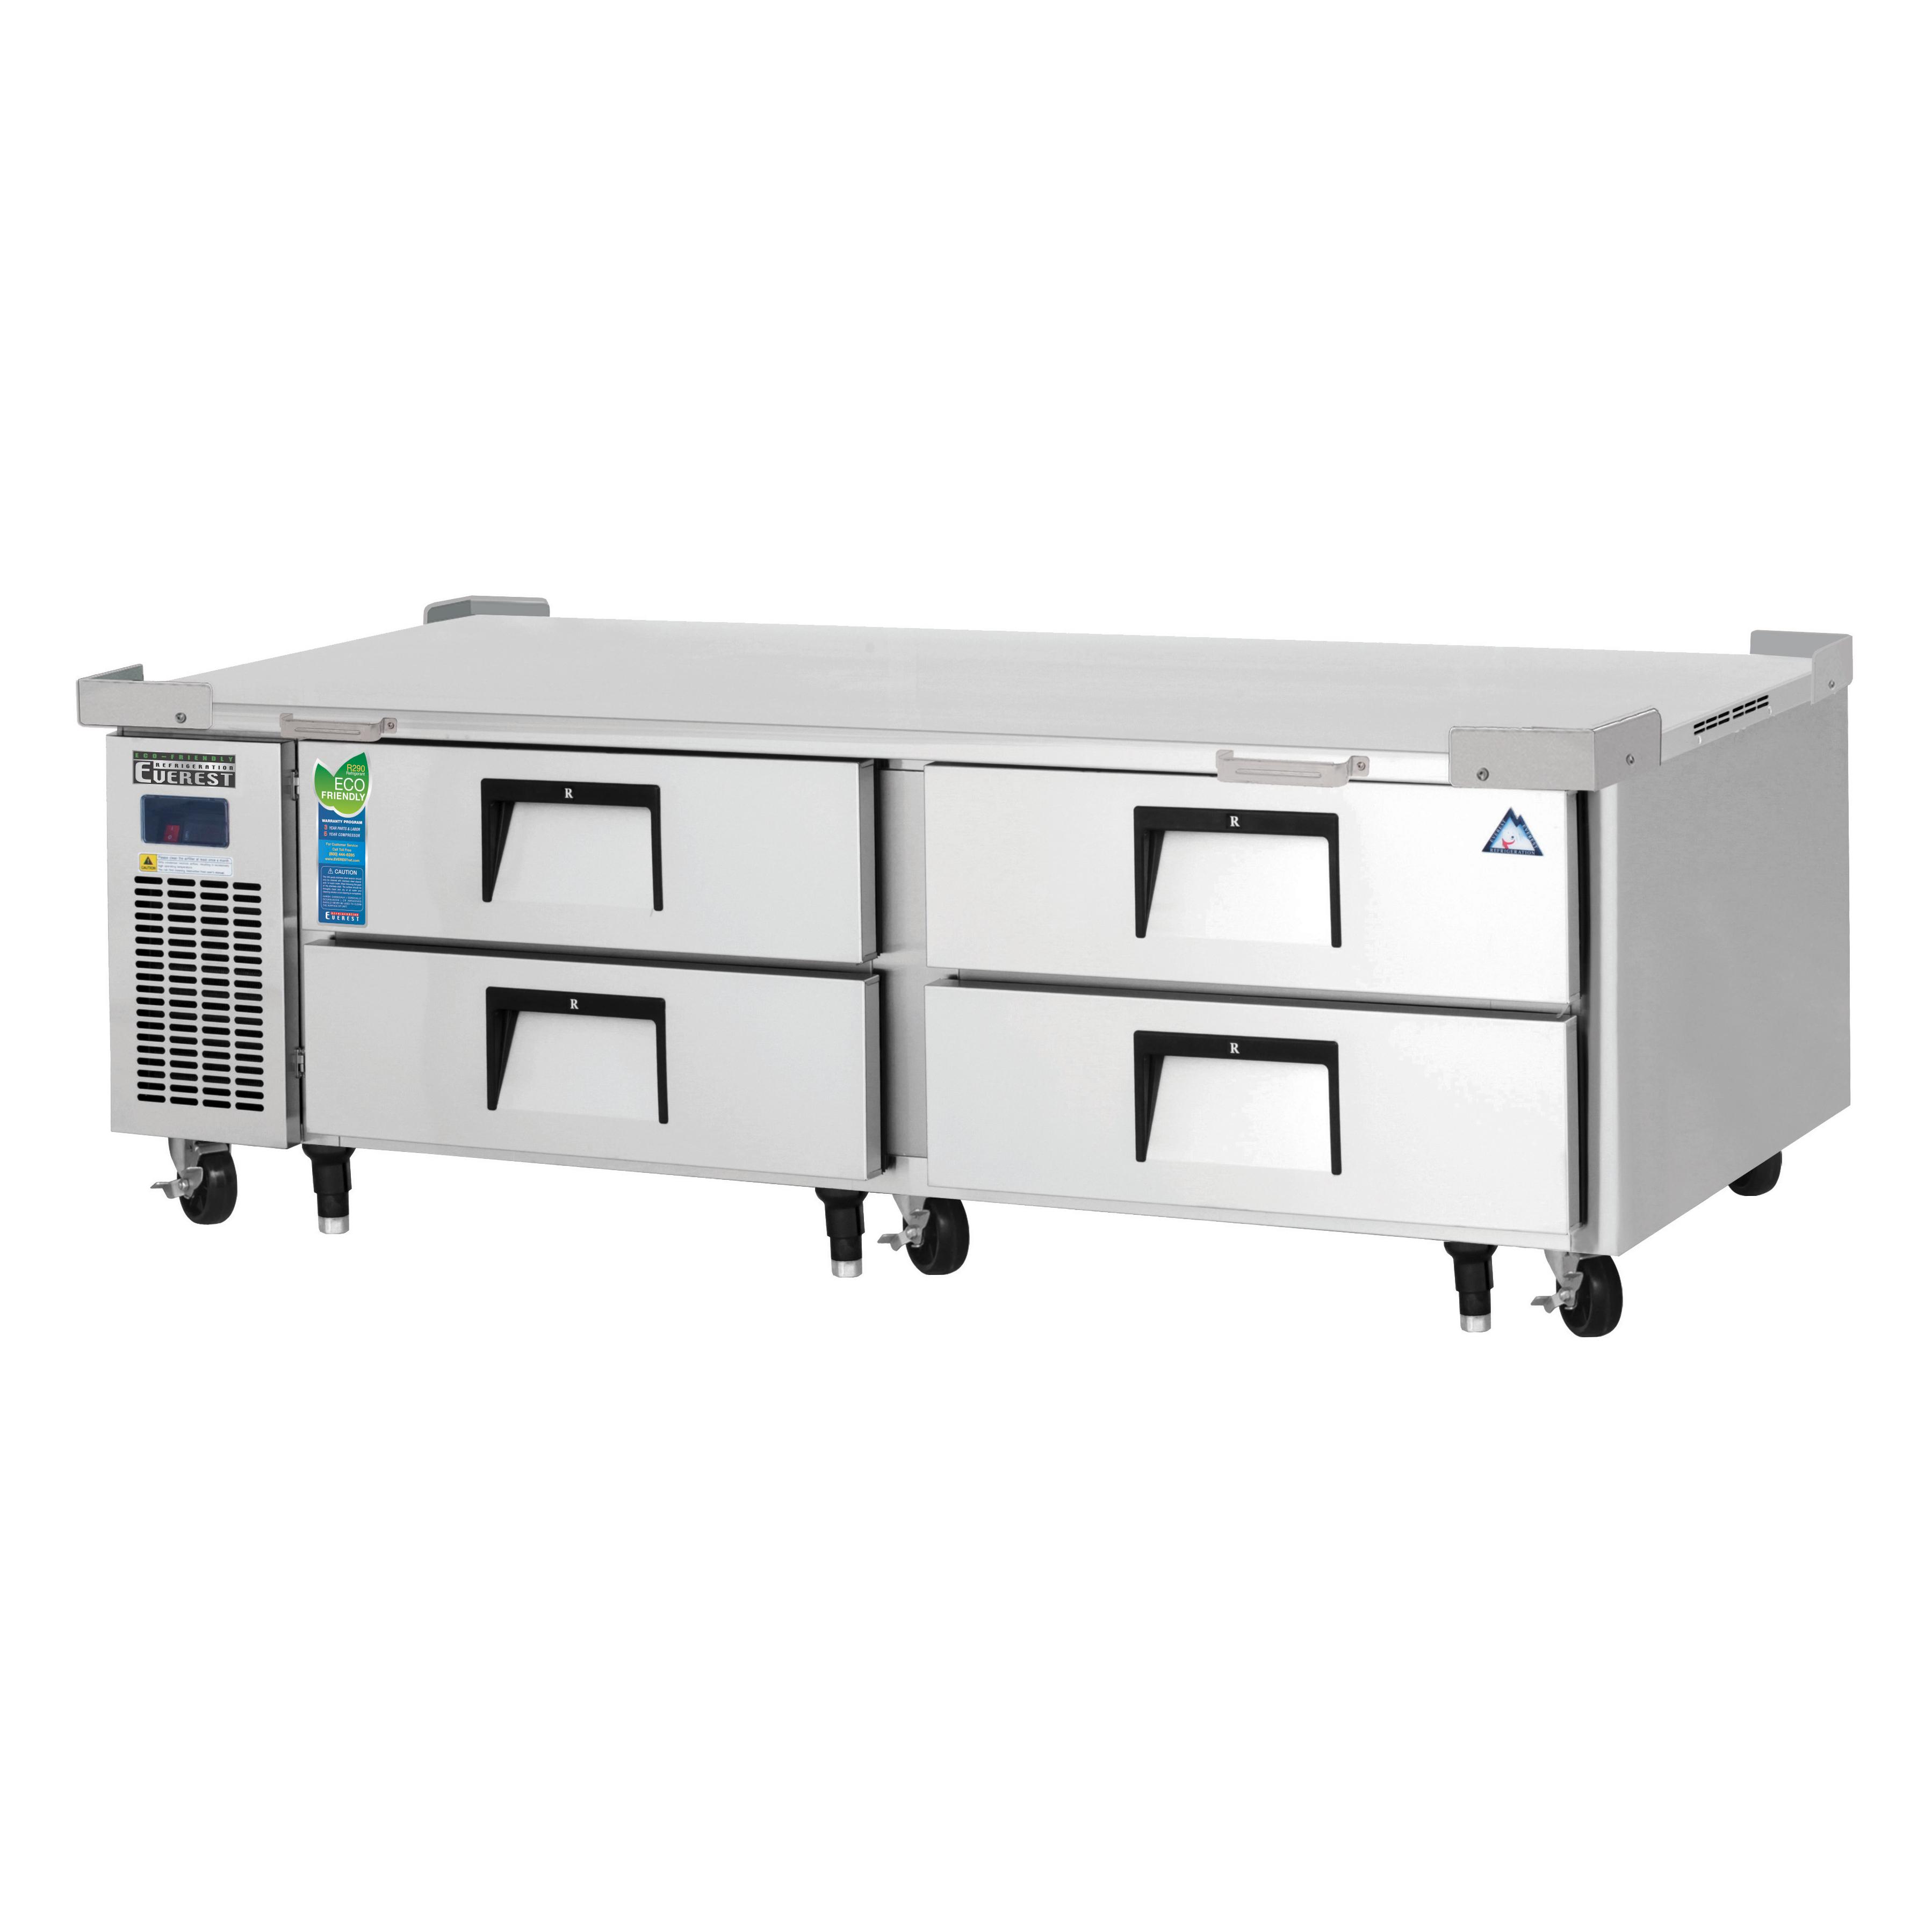 ECB72D4 Everest Refrigeration equipment stand, refrigerated base